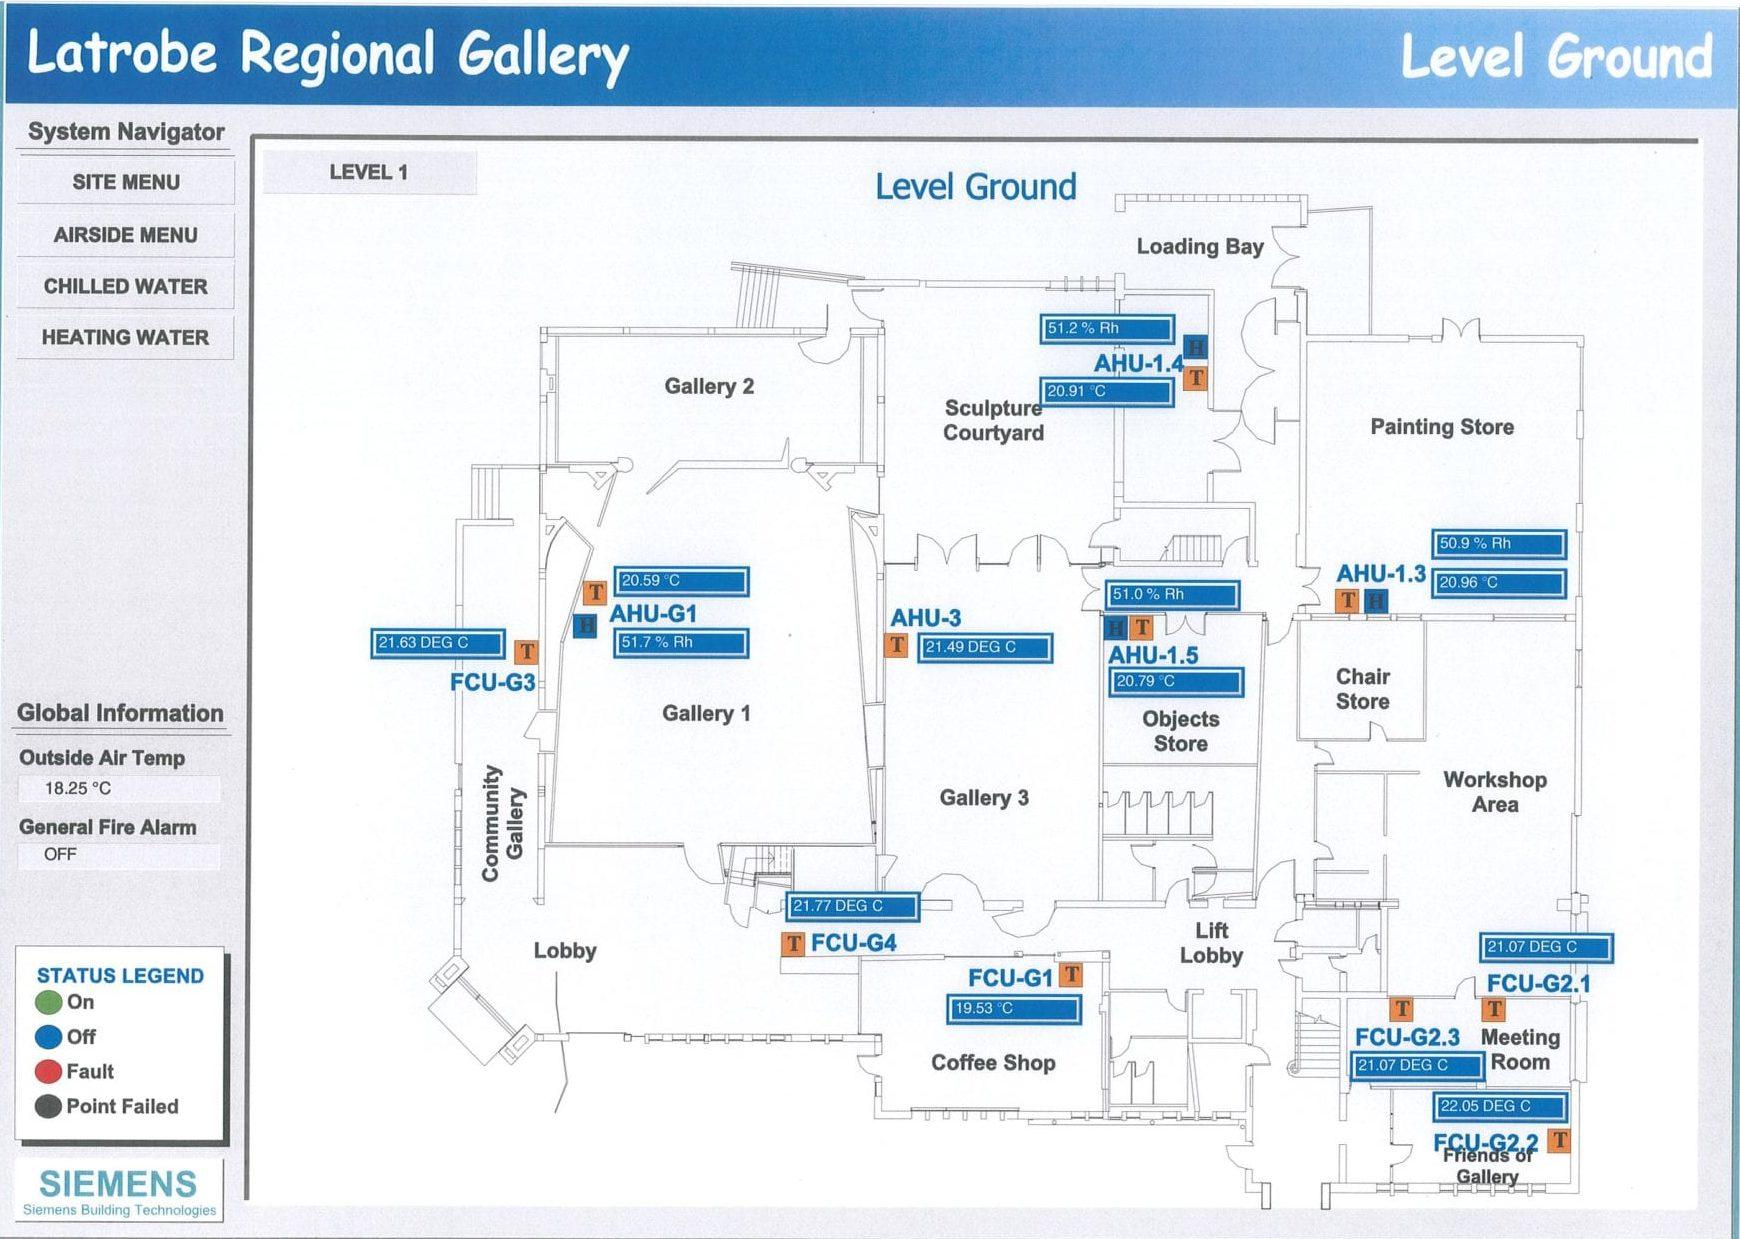 Digital climate control system, Ground Level. Latrobe Regional Gallery.